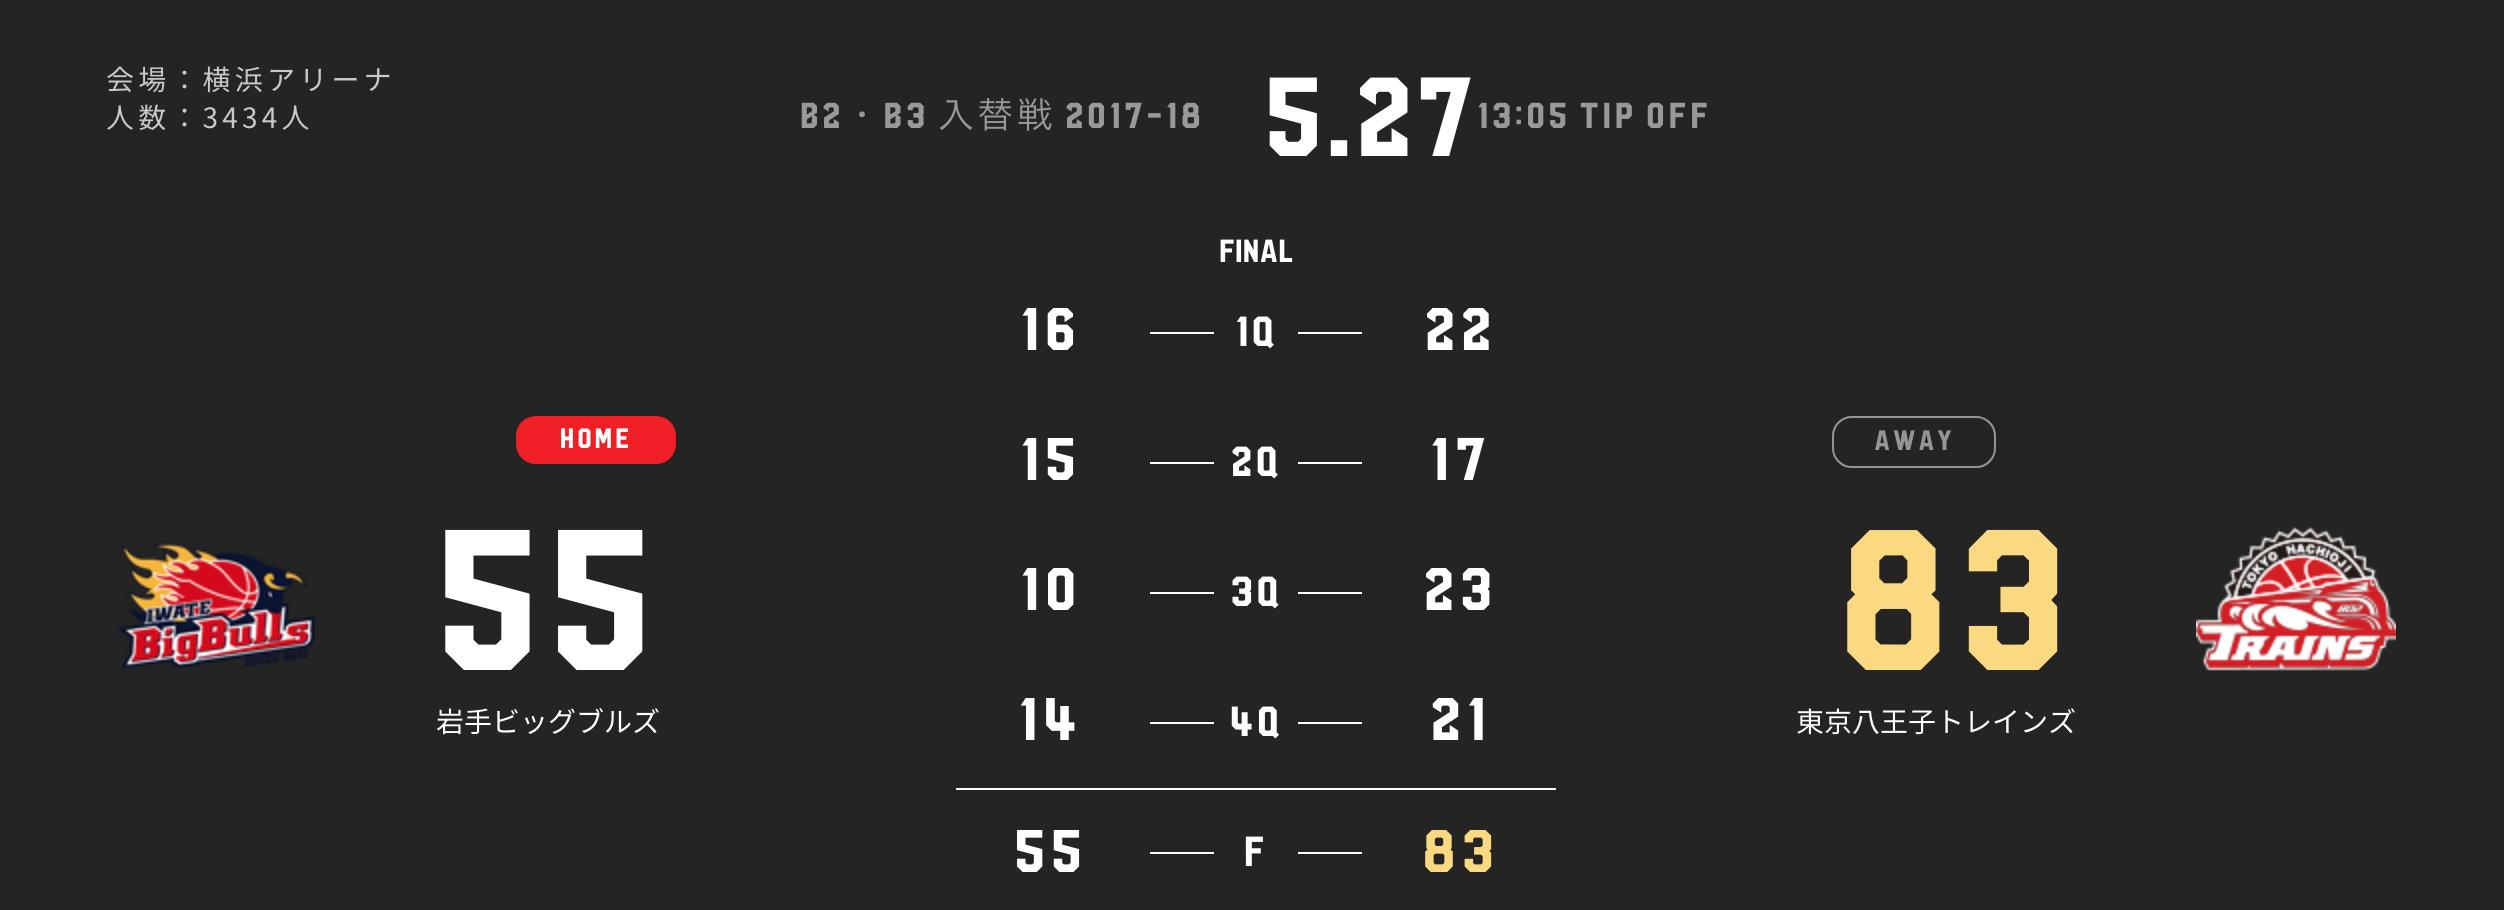 【Bリーグ】B2・B3入替戦 岩手ビッグブルズ vs 東京八王子トレインズ